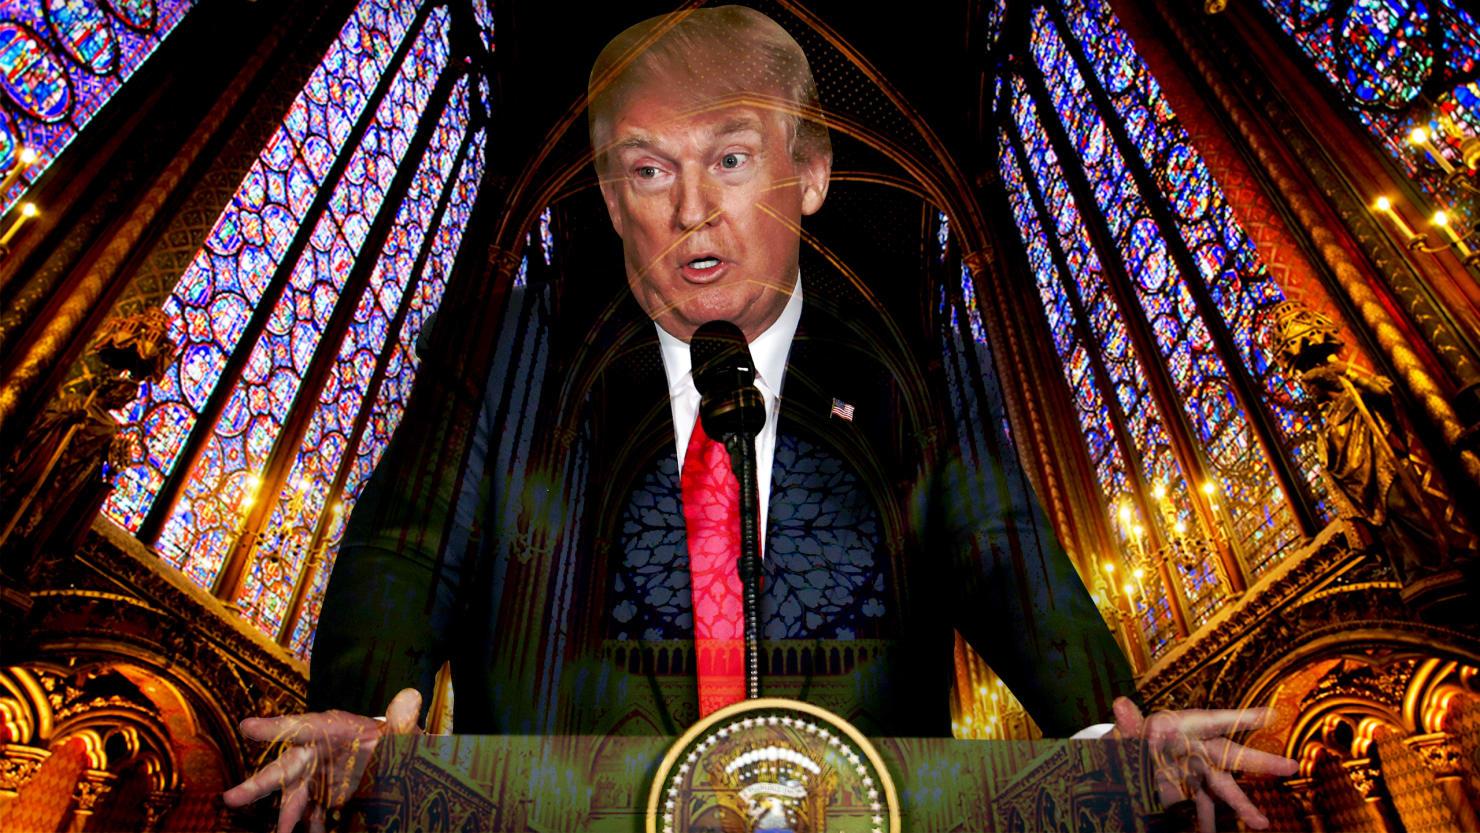 The Faith of Donald Trump Is Fake, But All Too Familiar